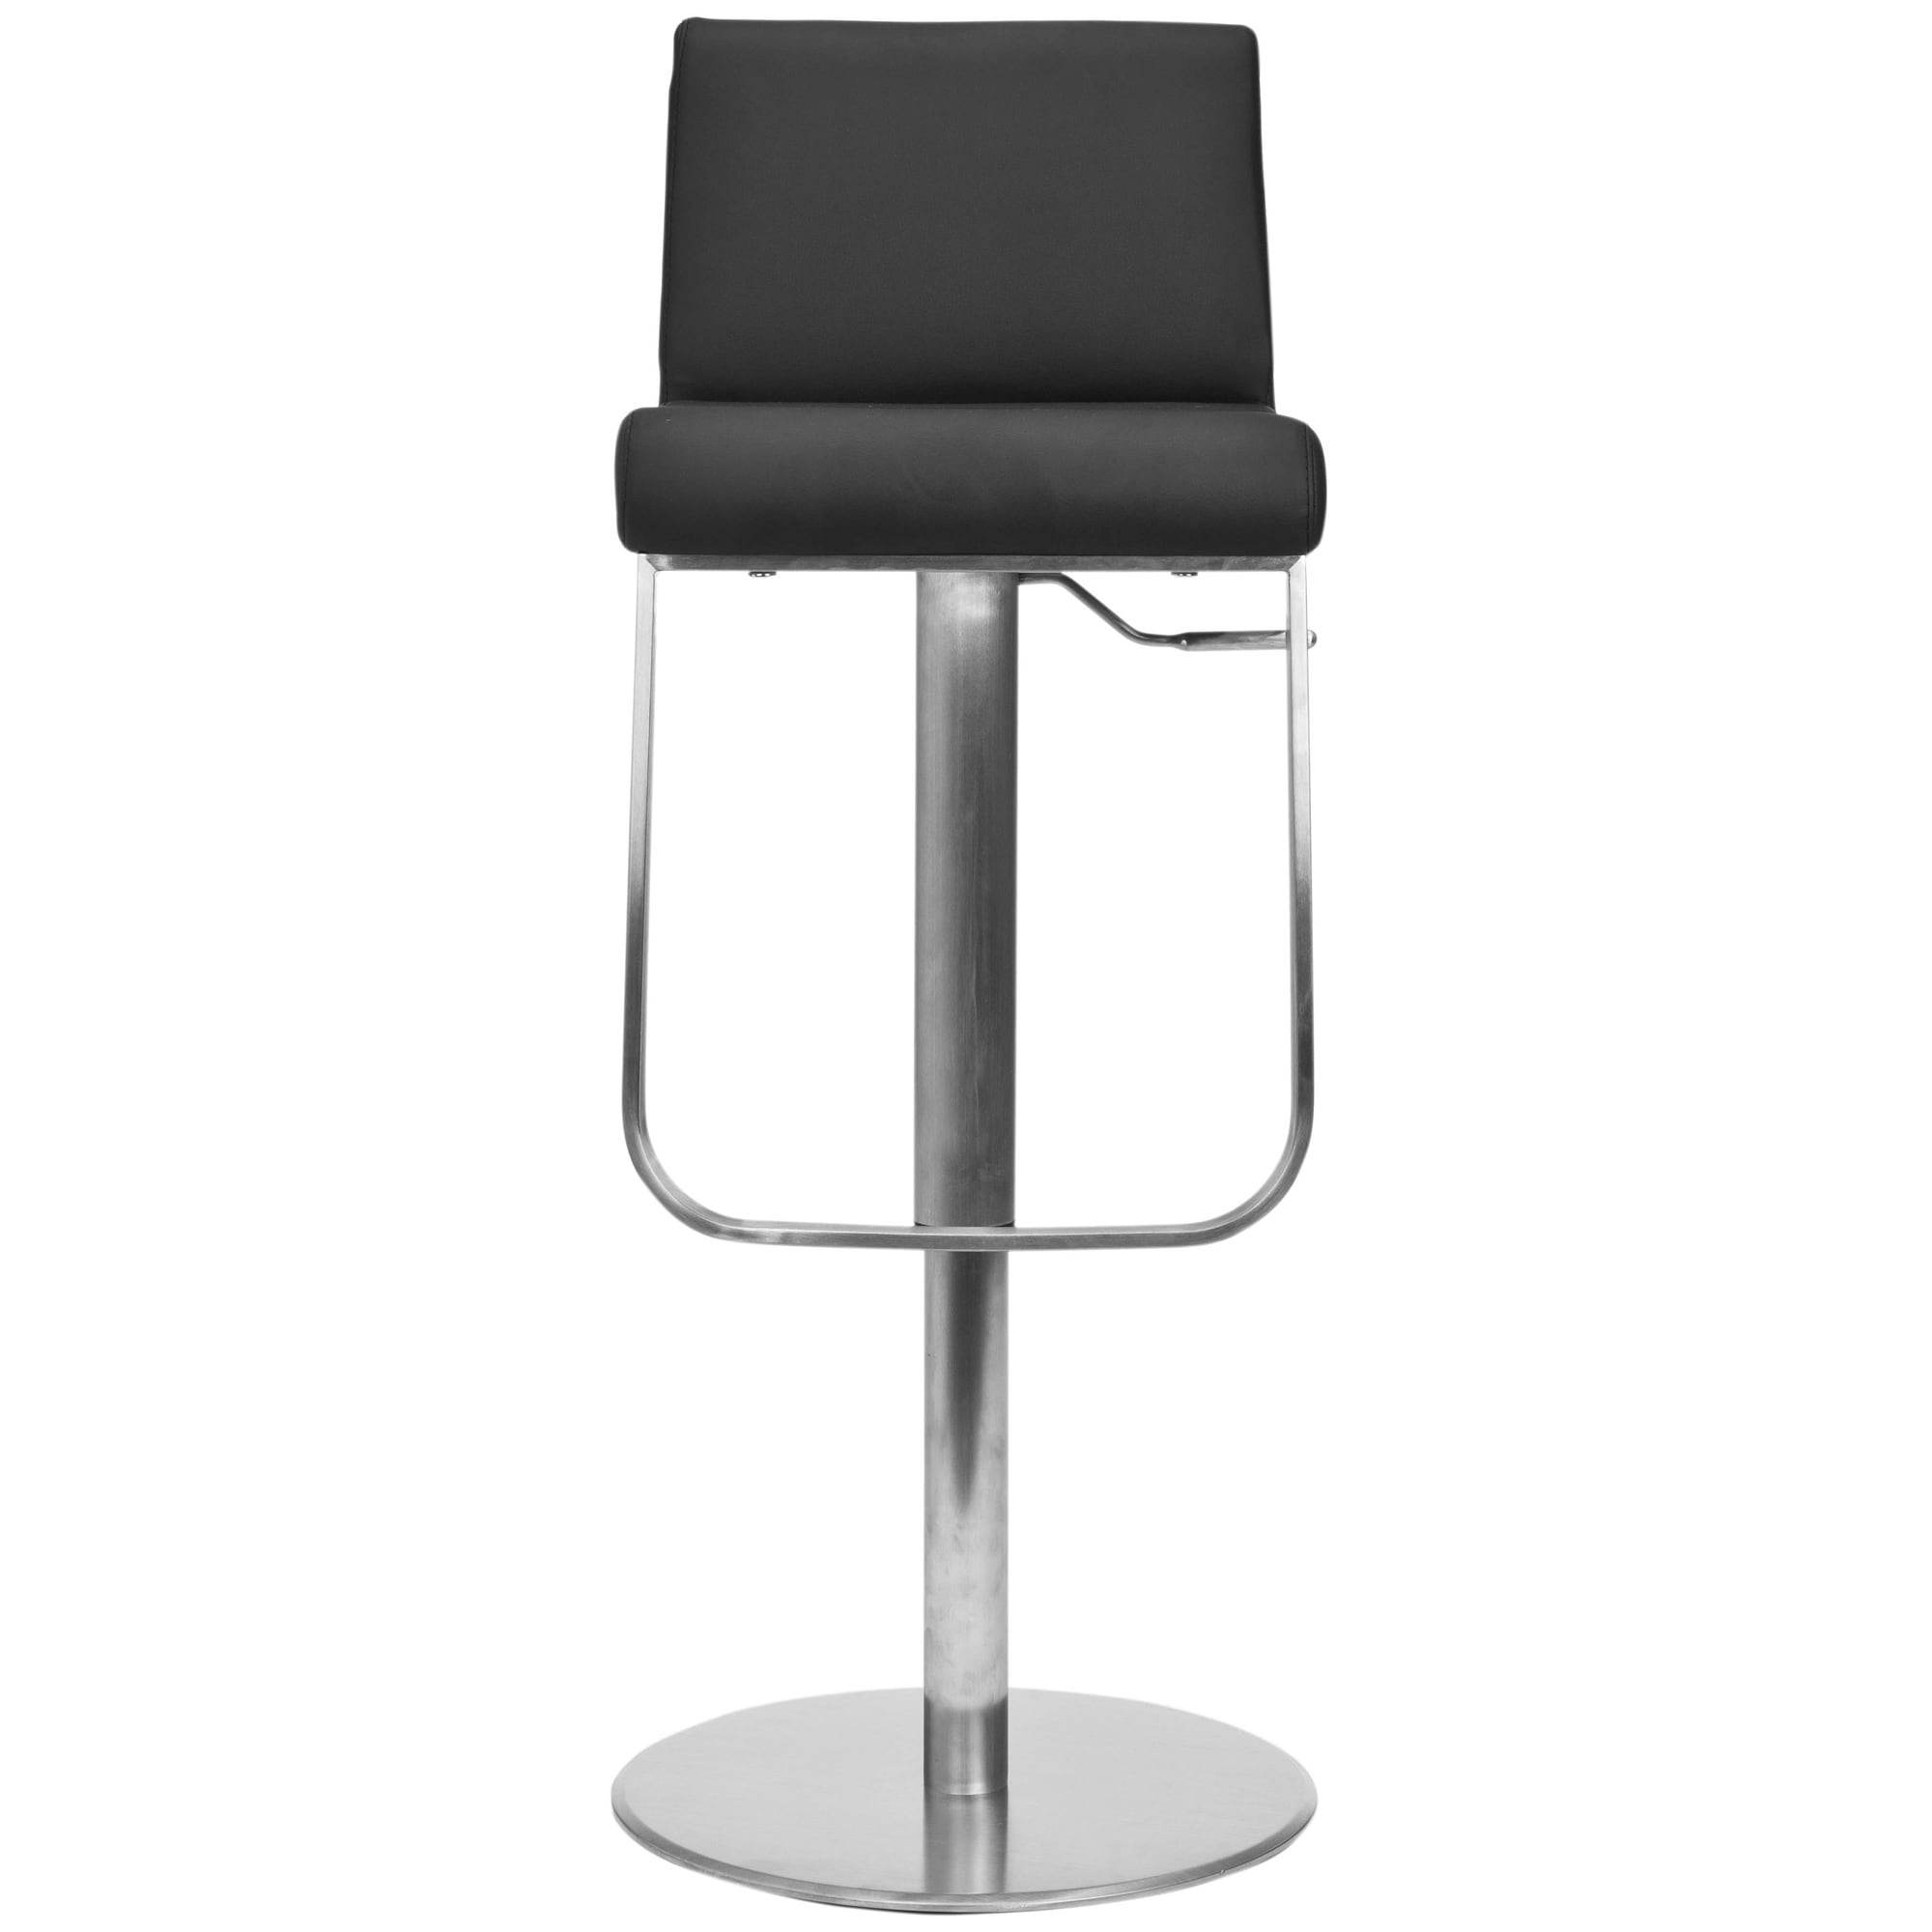 Fine Safavieh Stanley Black Leather Adjustable 24 33 Inch Swivel Modern Bar Stool 19 3 X 16 5 X 32 7 Squirreltailoven Fun Painted Chair Ideas Images Squirreltailovenorg